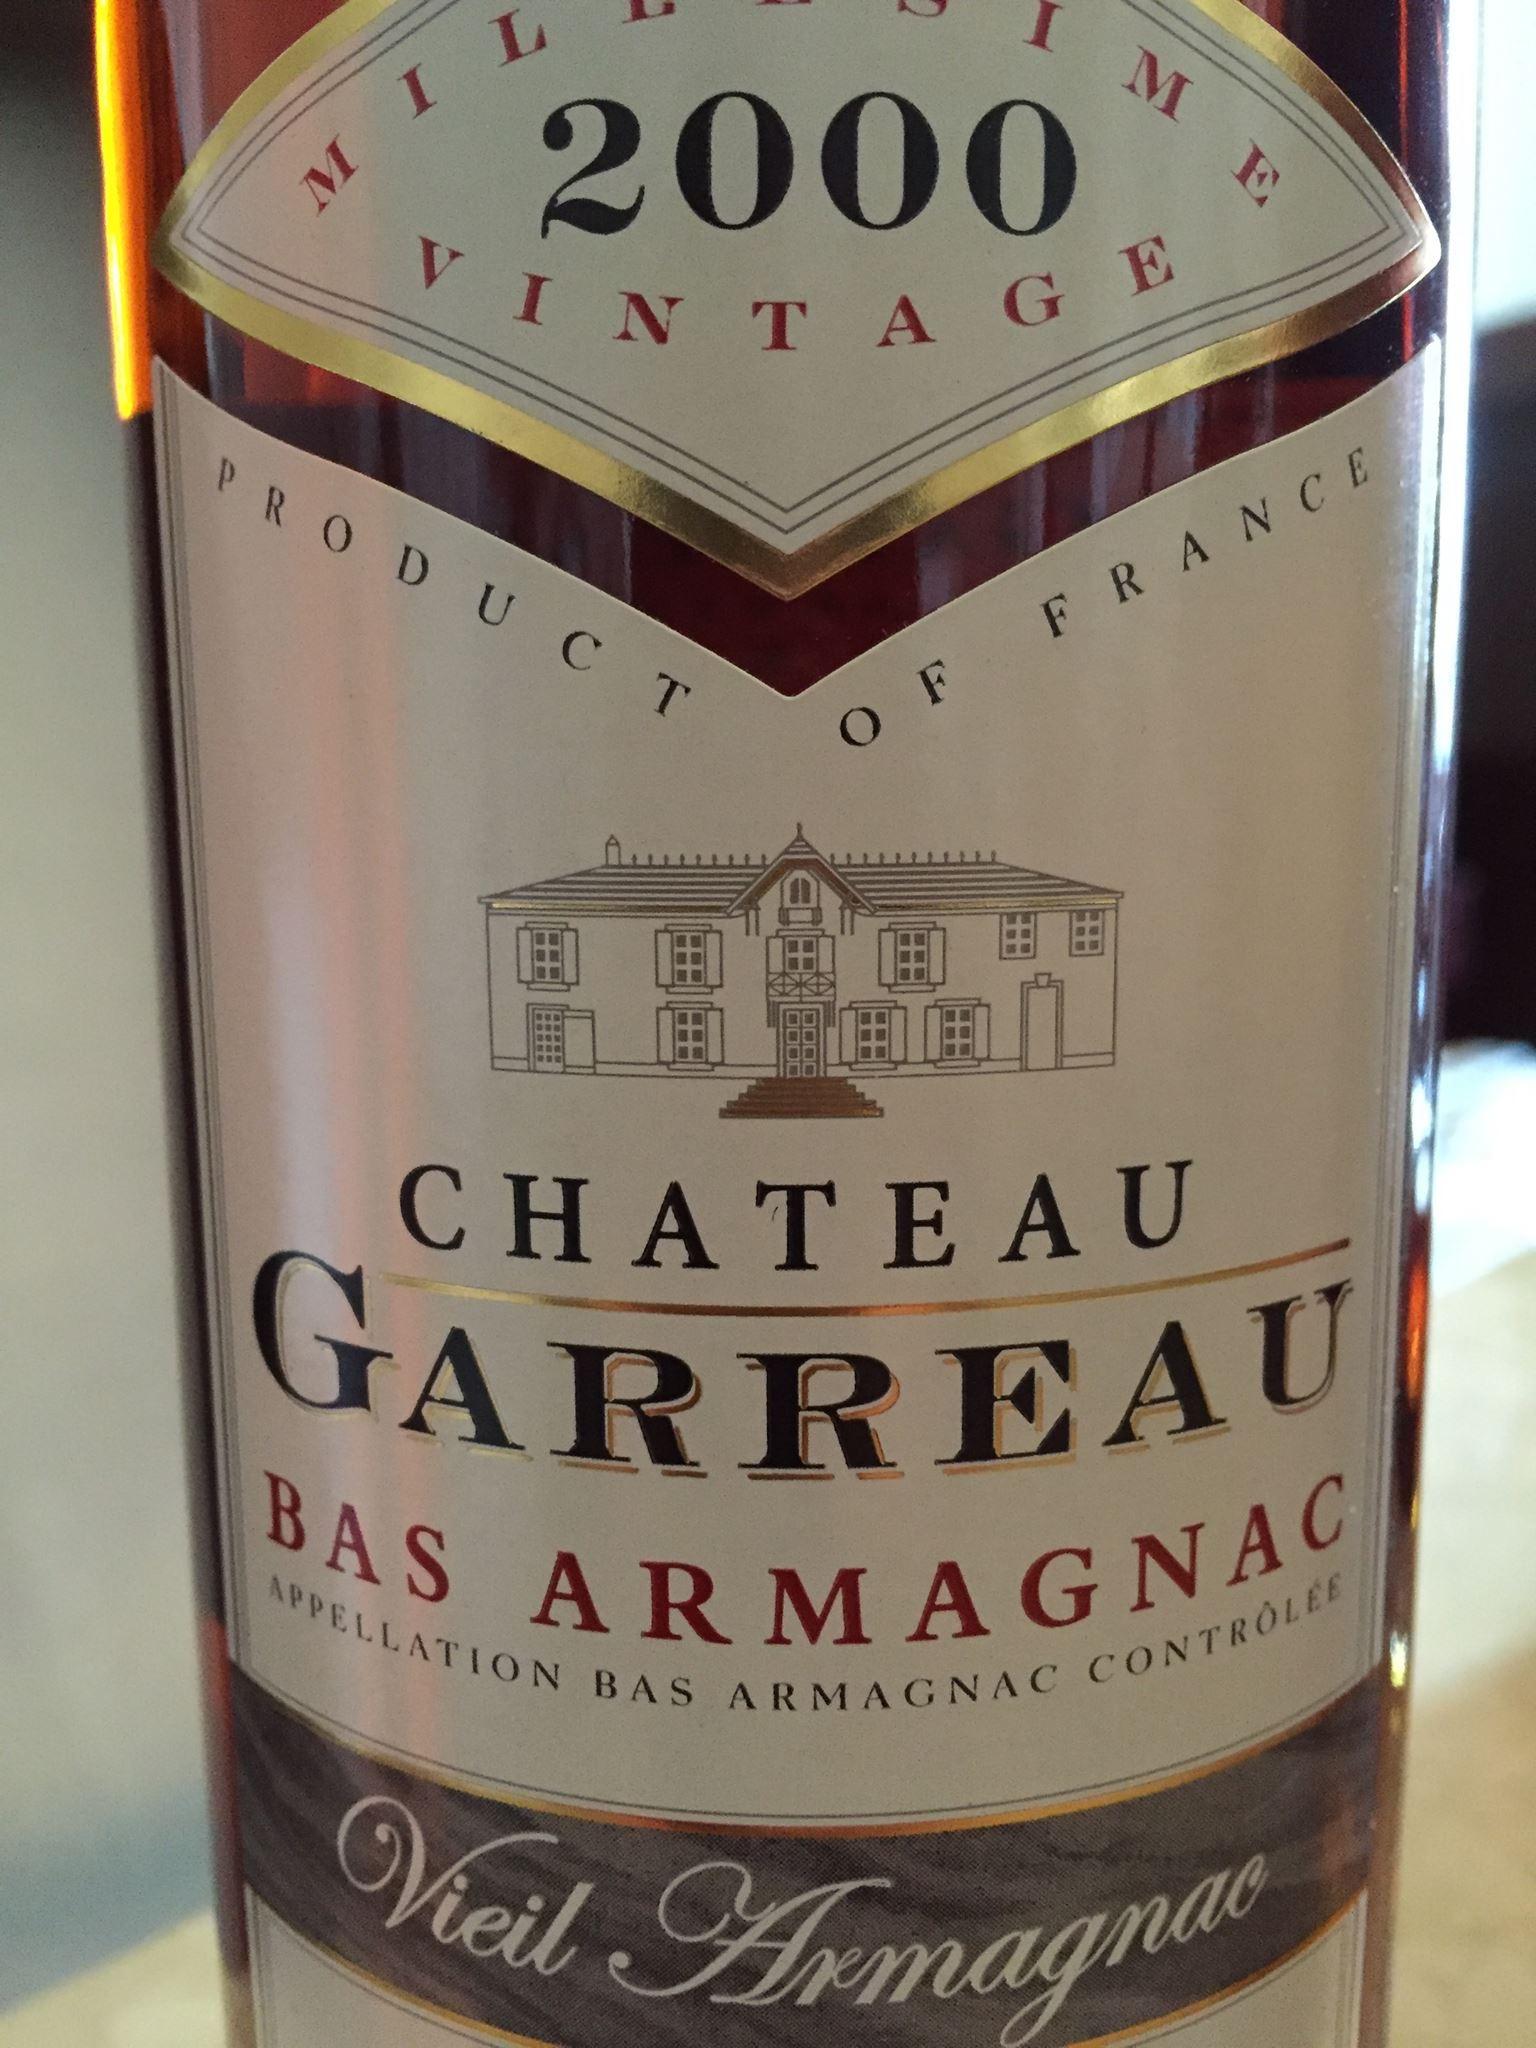 Château Garreau 2000 – Bas-Armagnac – Viel Armagnac